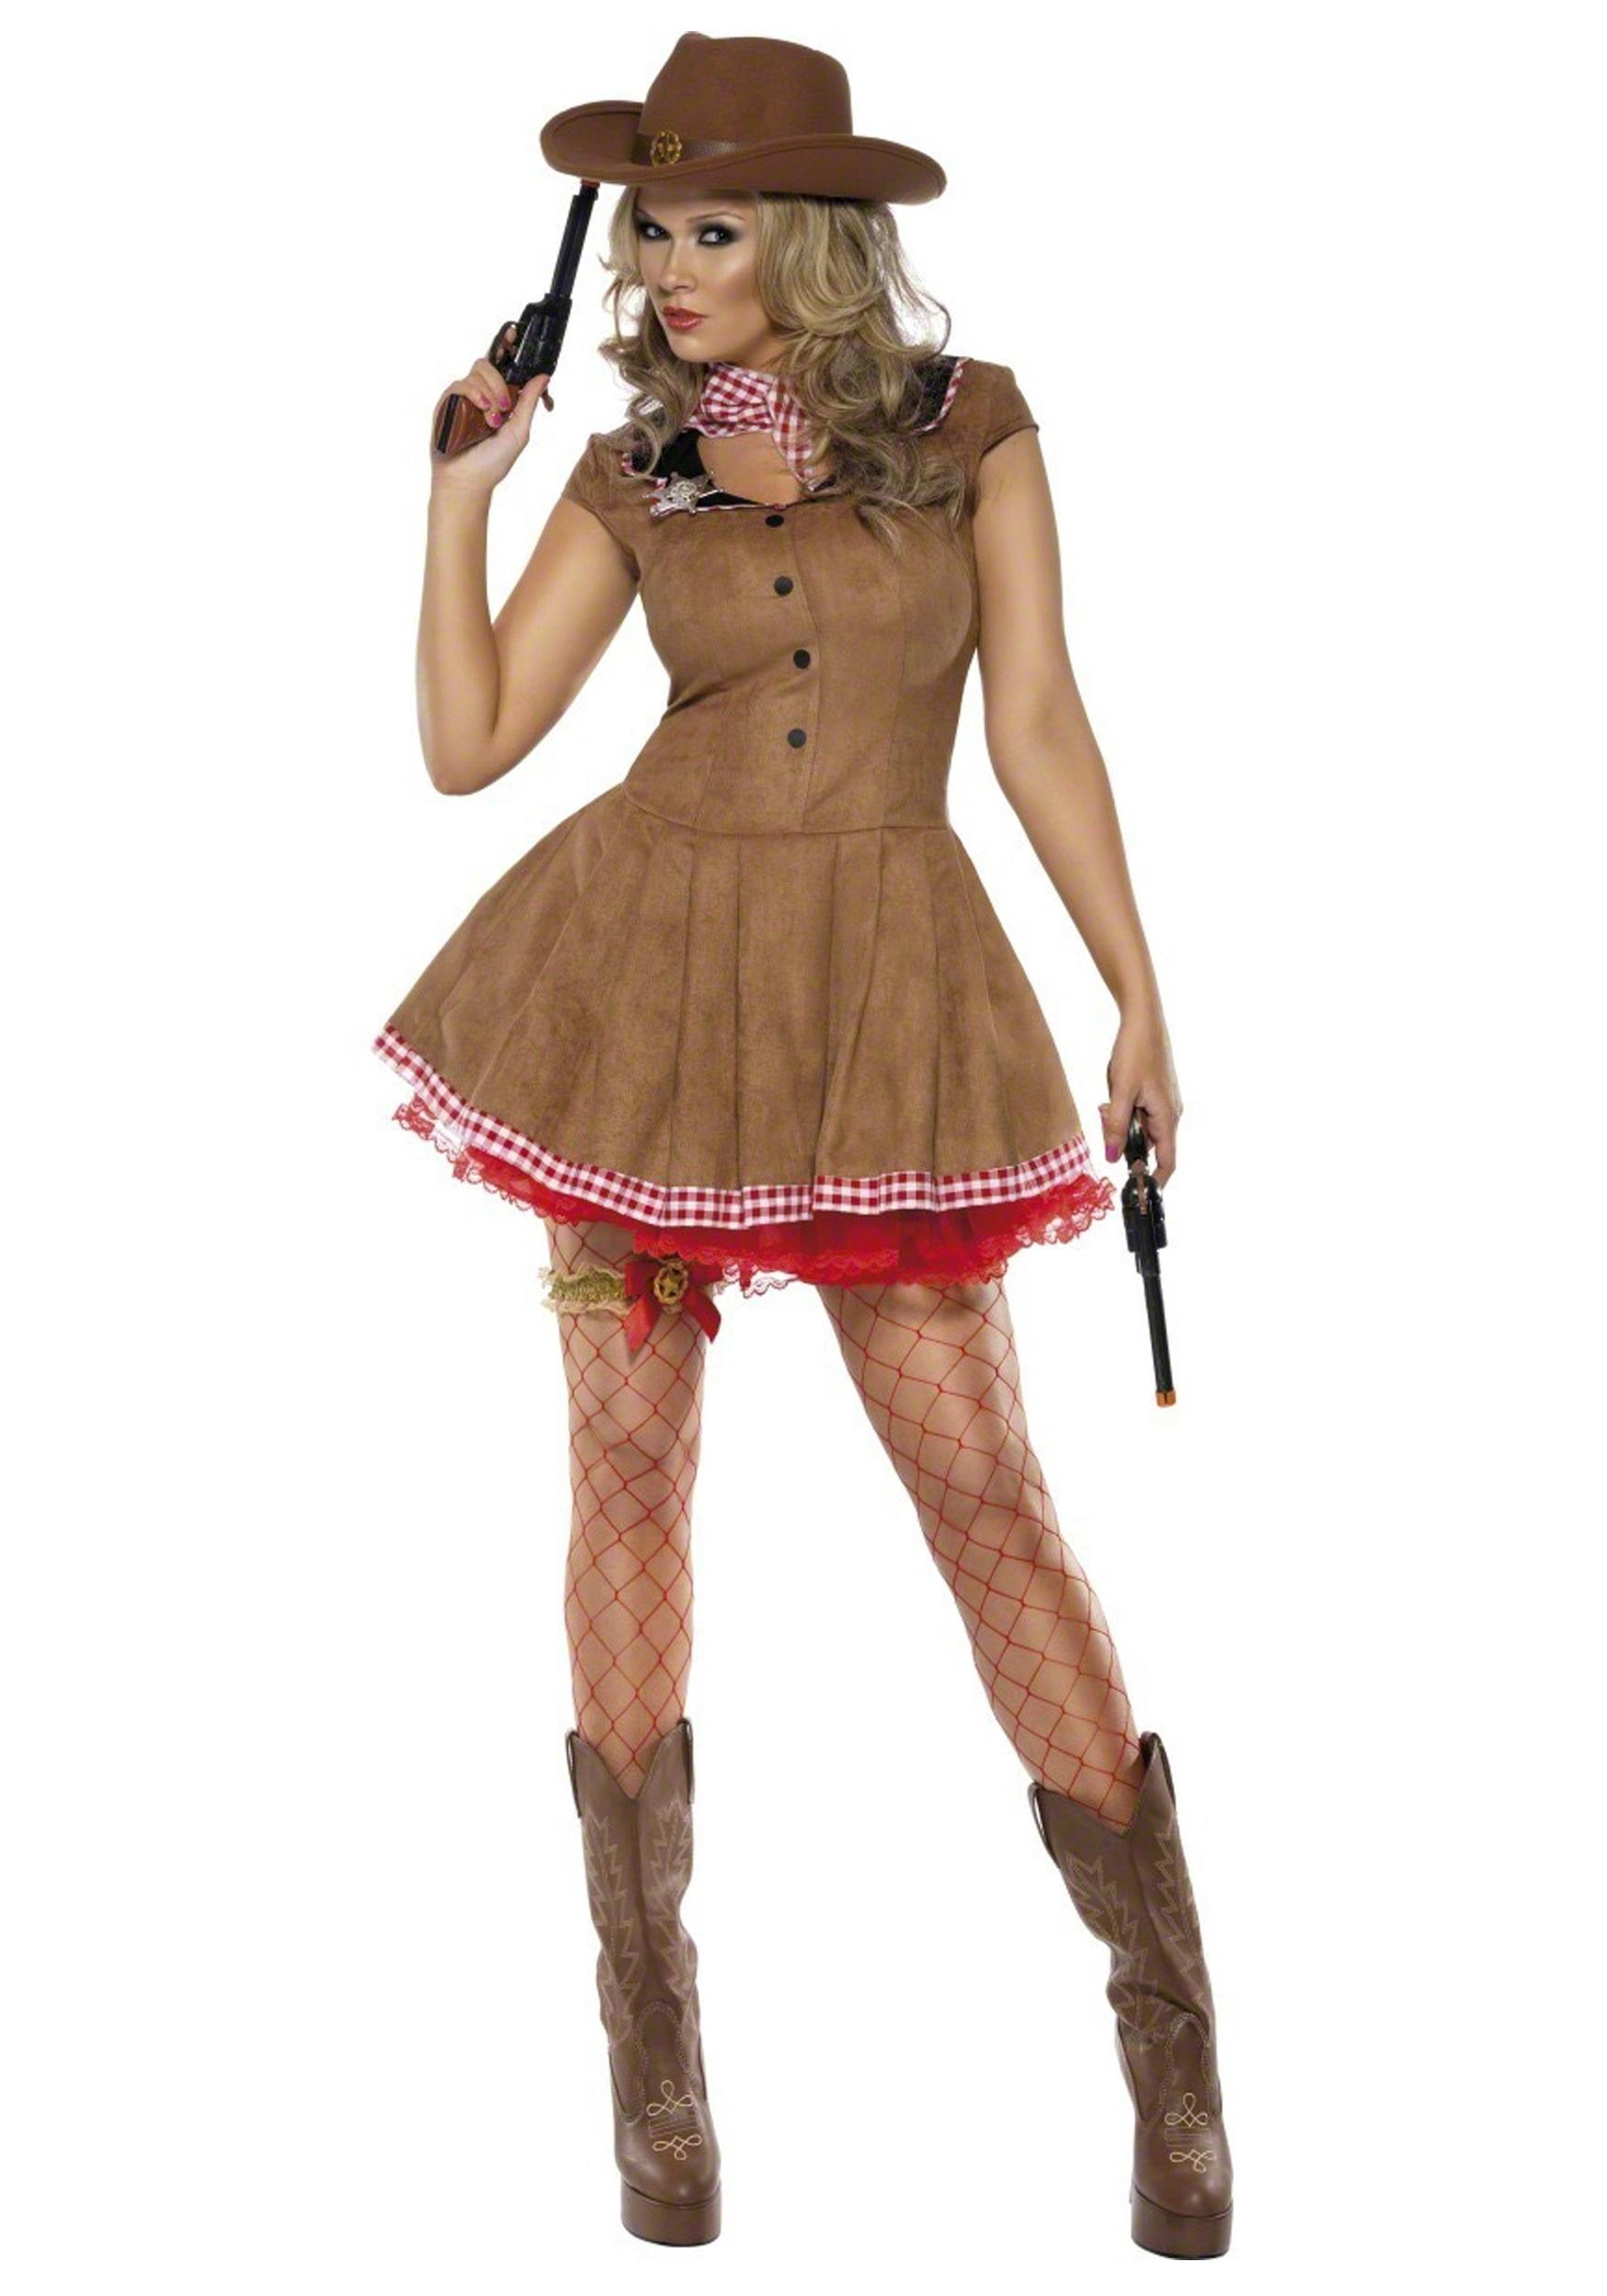 Awe Inspiring Wild West Cowgirl Costume Short Hairstyles For Black Women Fulllsitofus